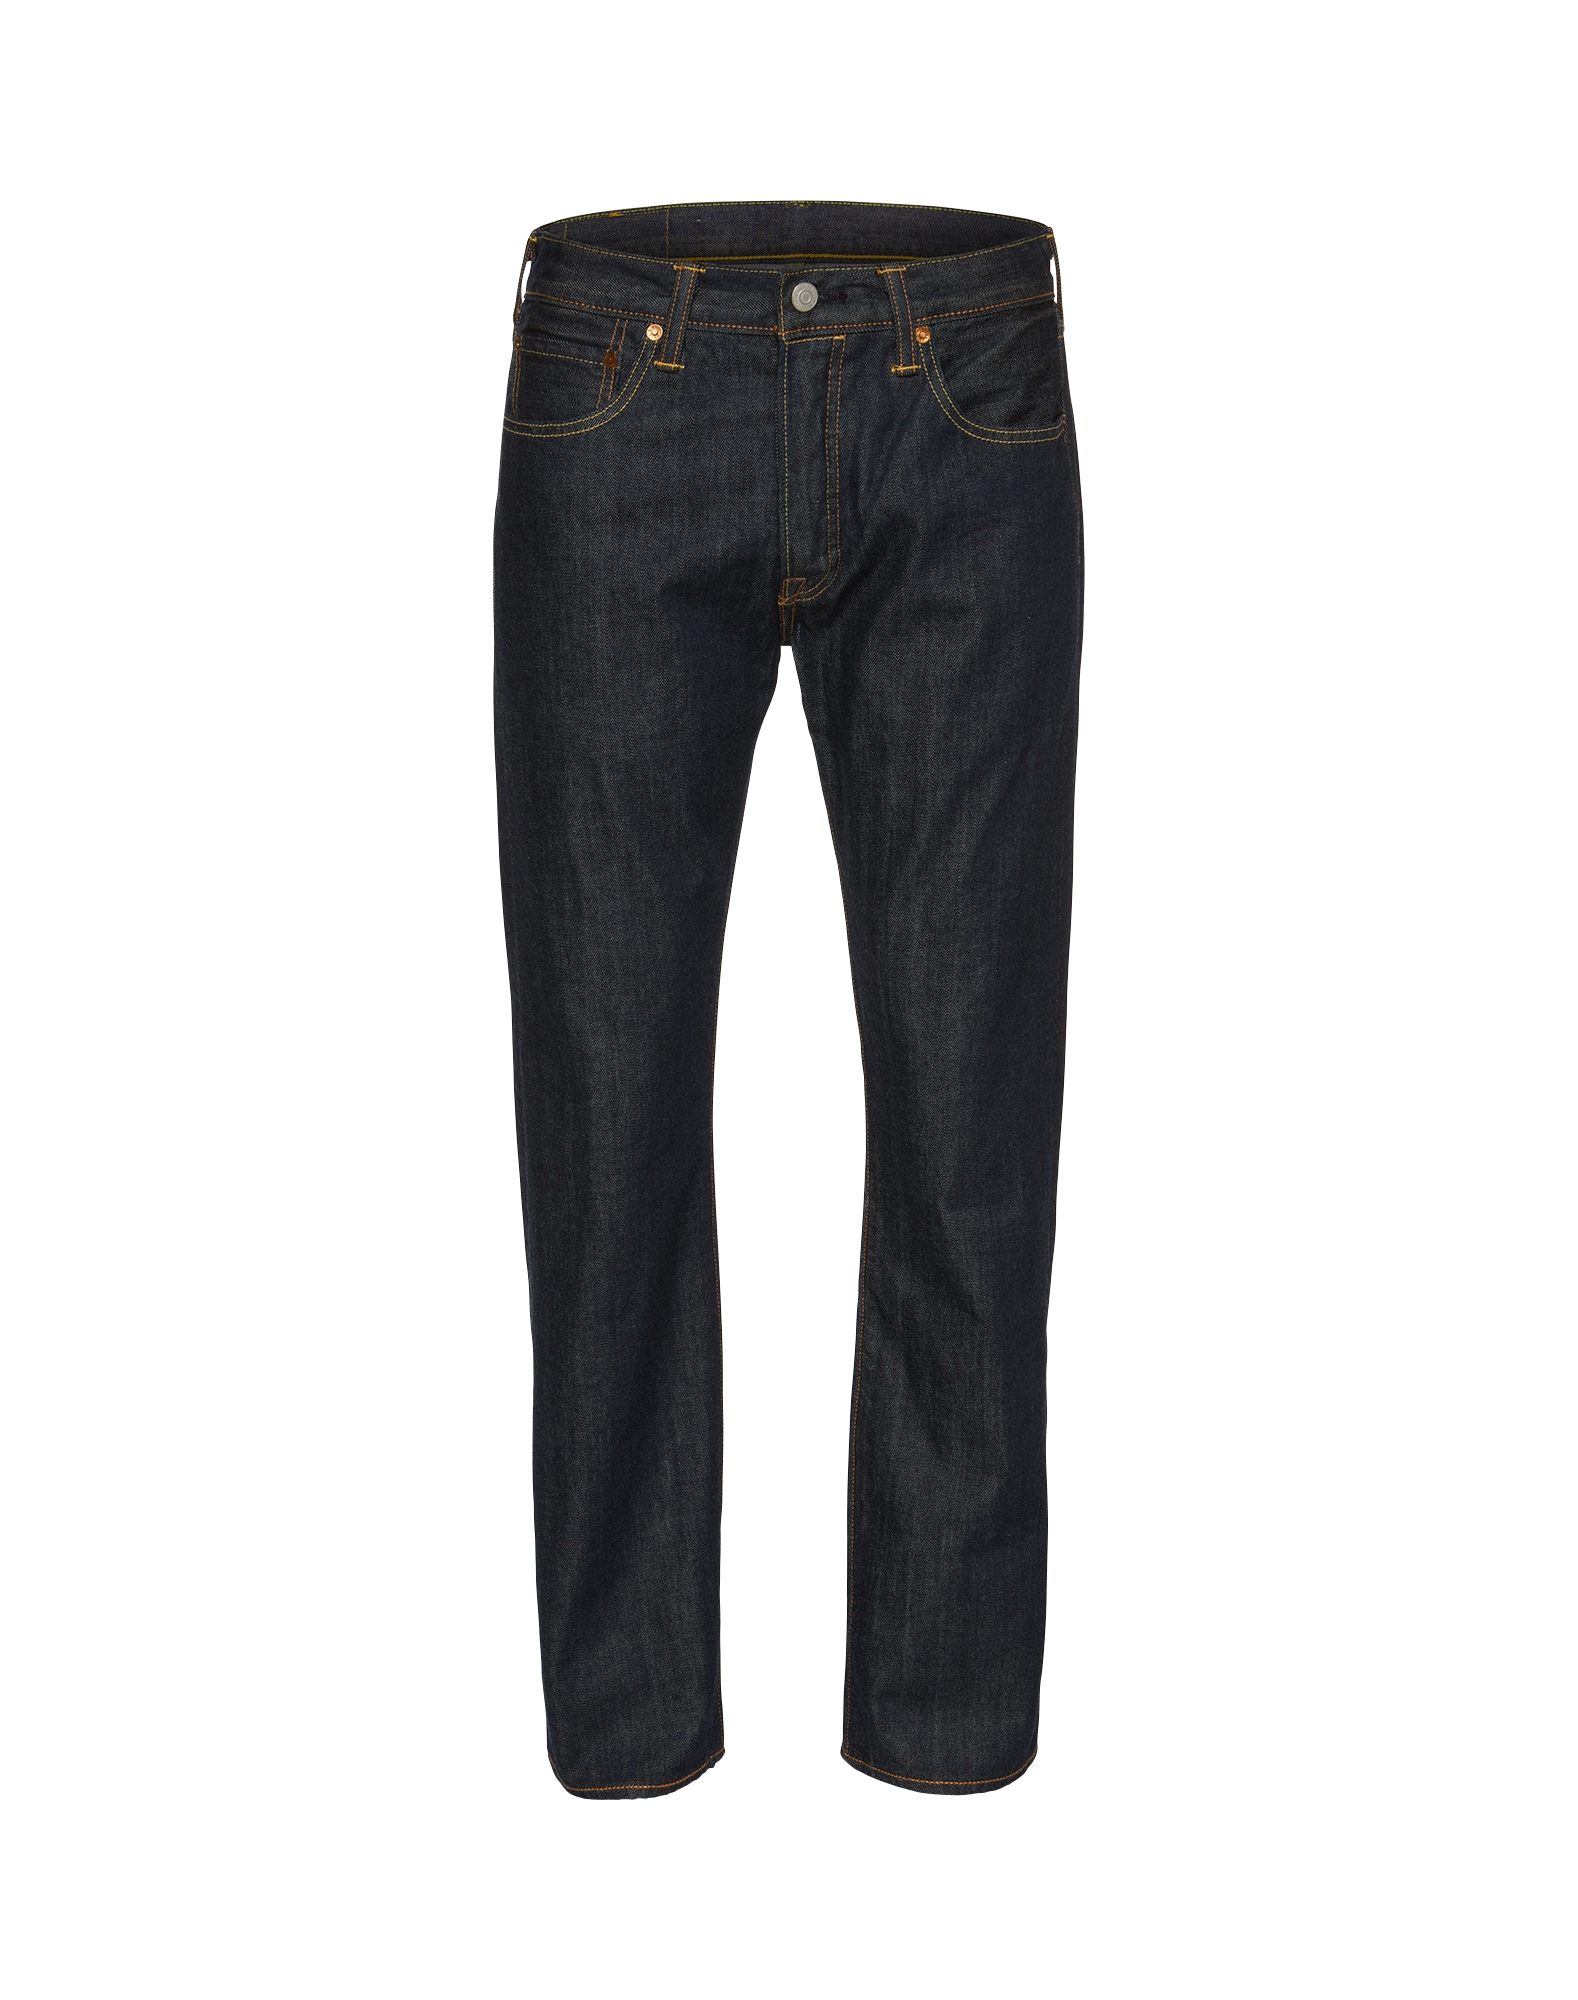 LEVI'S Heren Jeans 501 ORIGINAL FIT donkerblauw